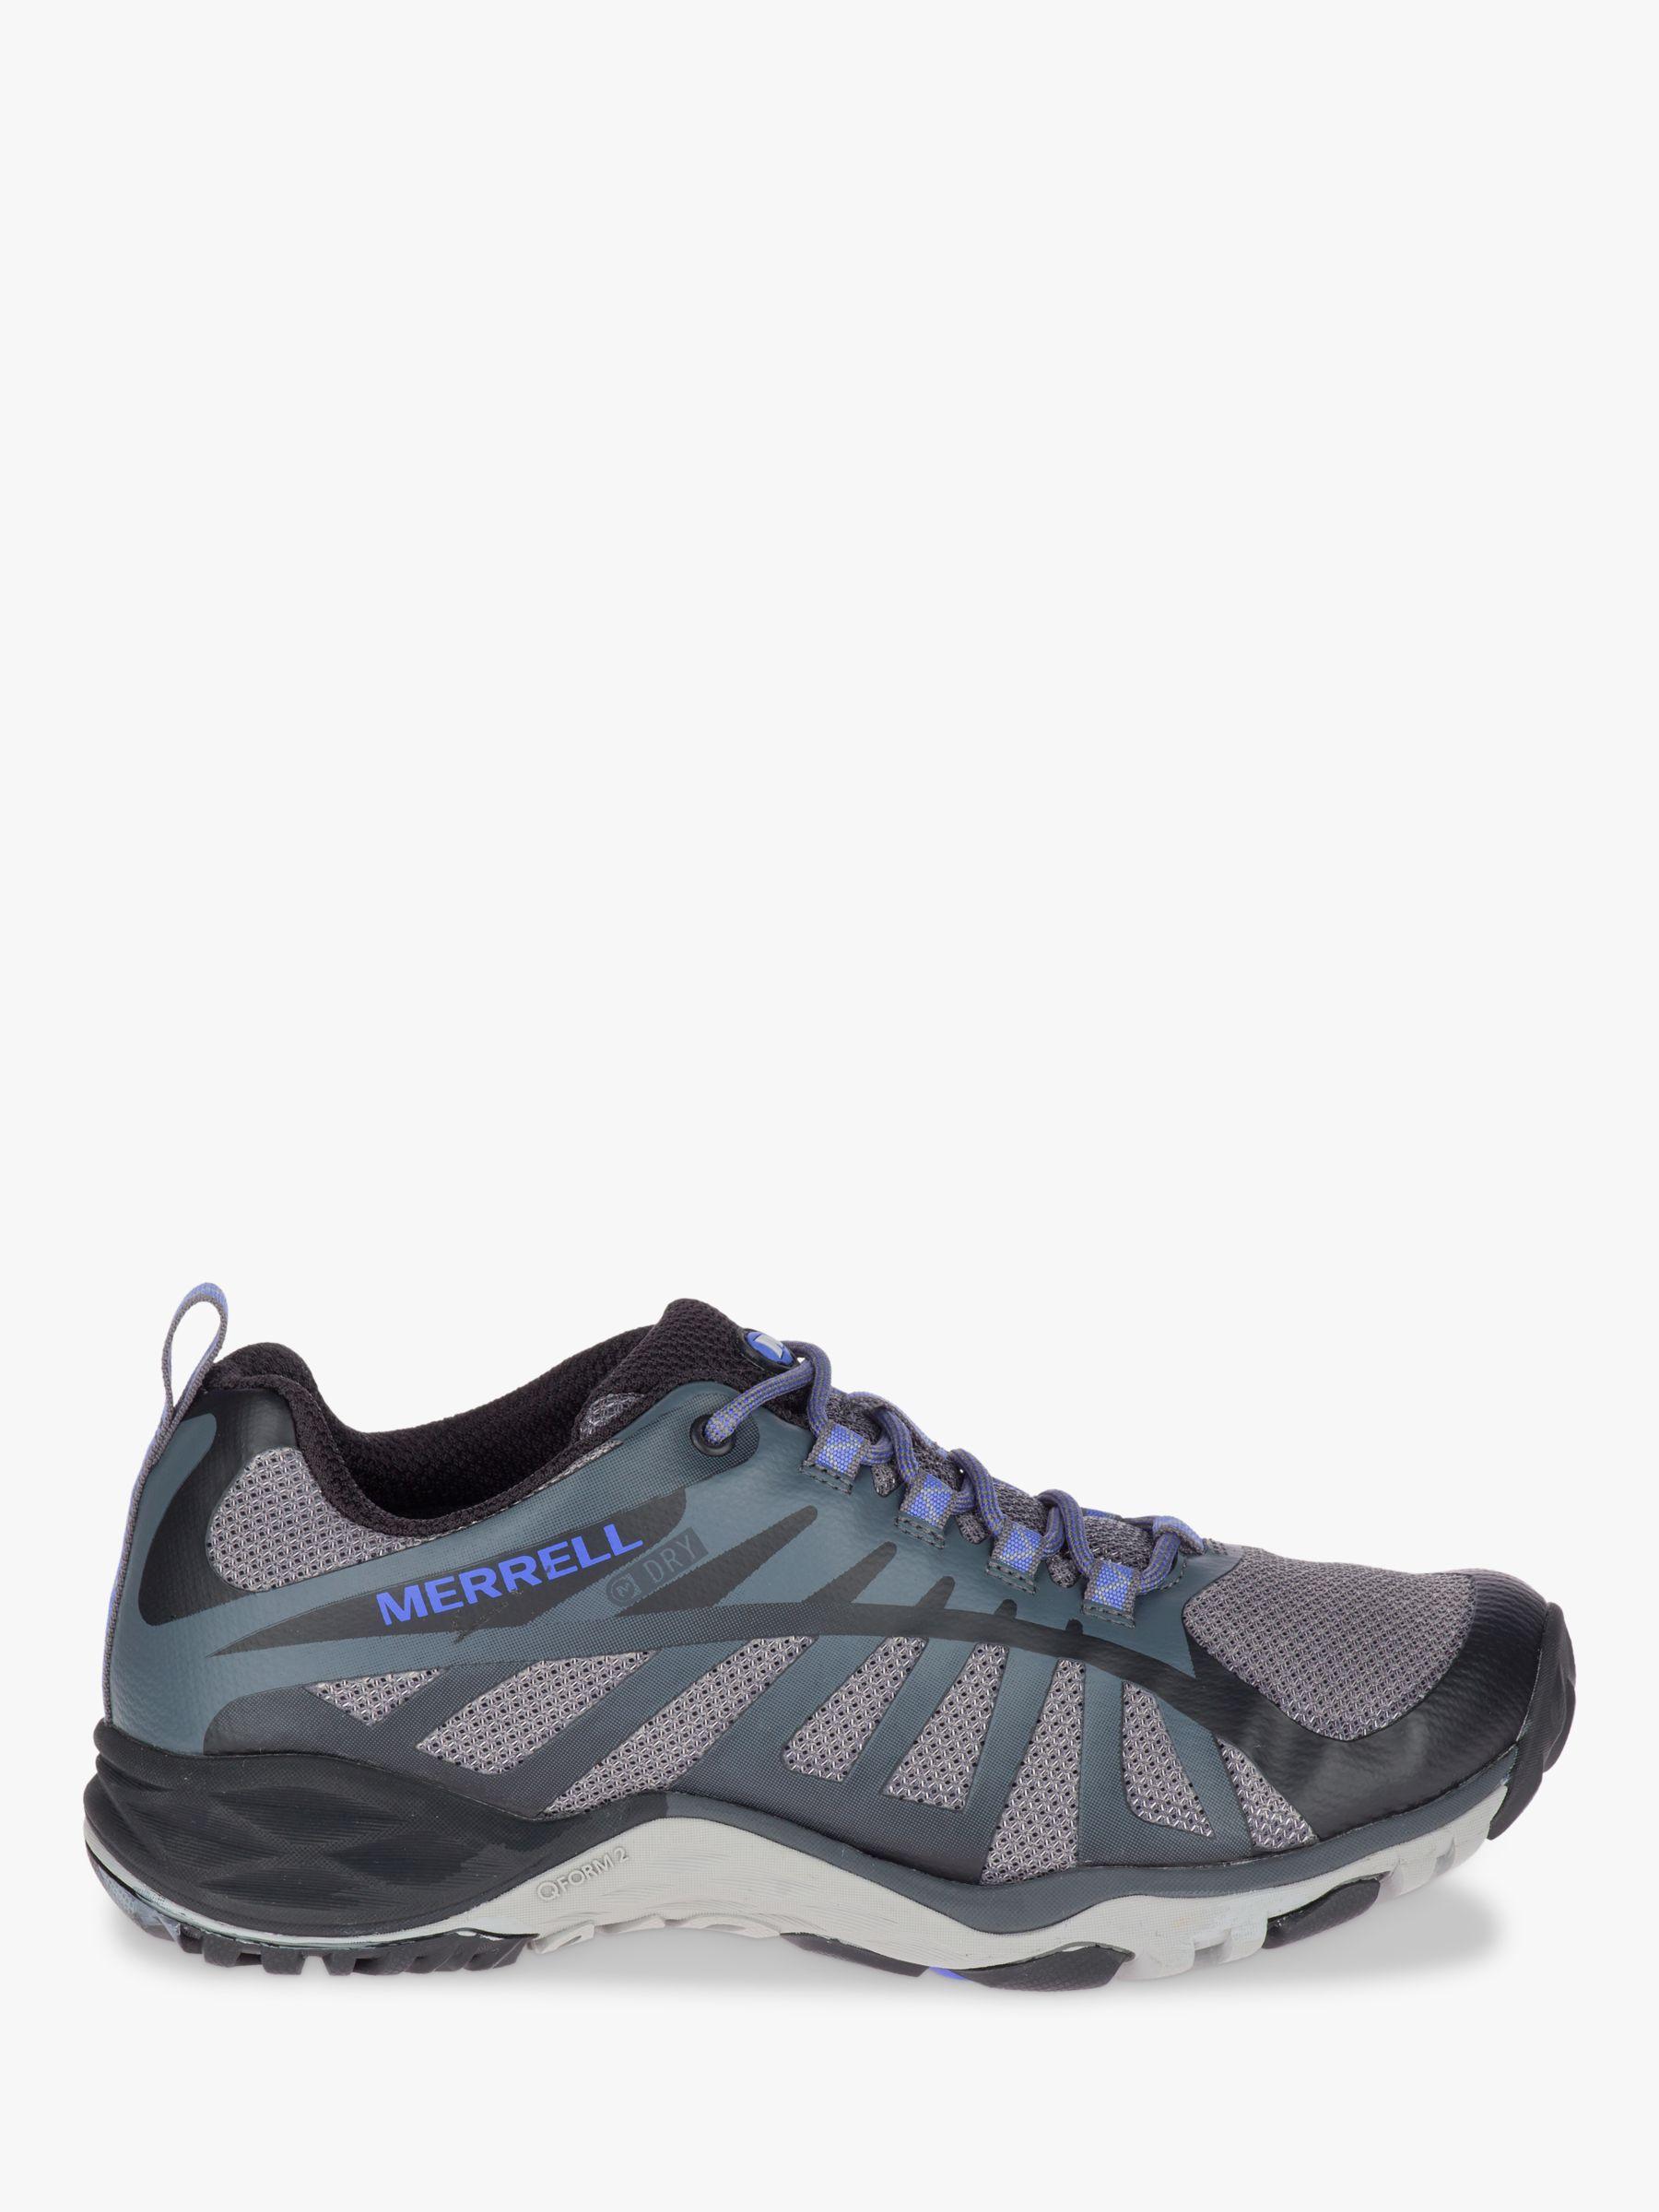 Merrell Merrell Siren Strap Q2 Women's Walking Shoes, Black